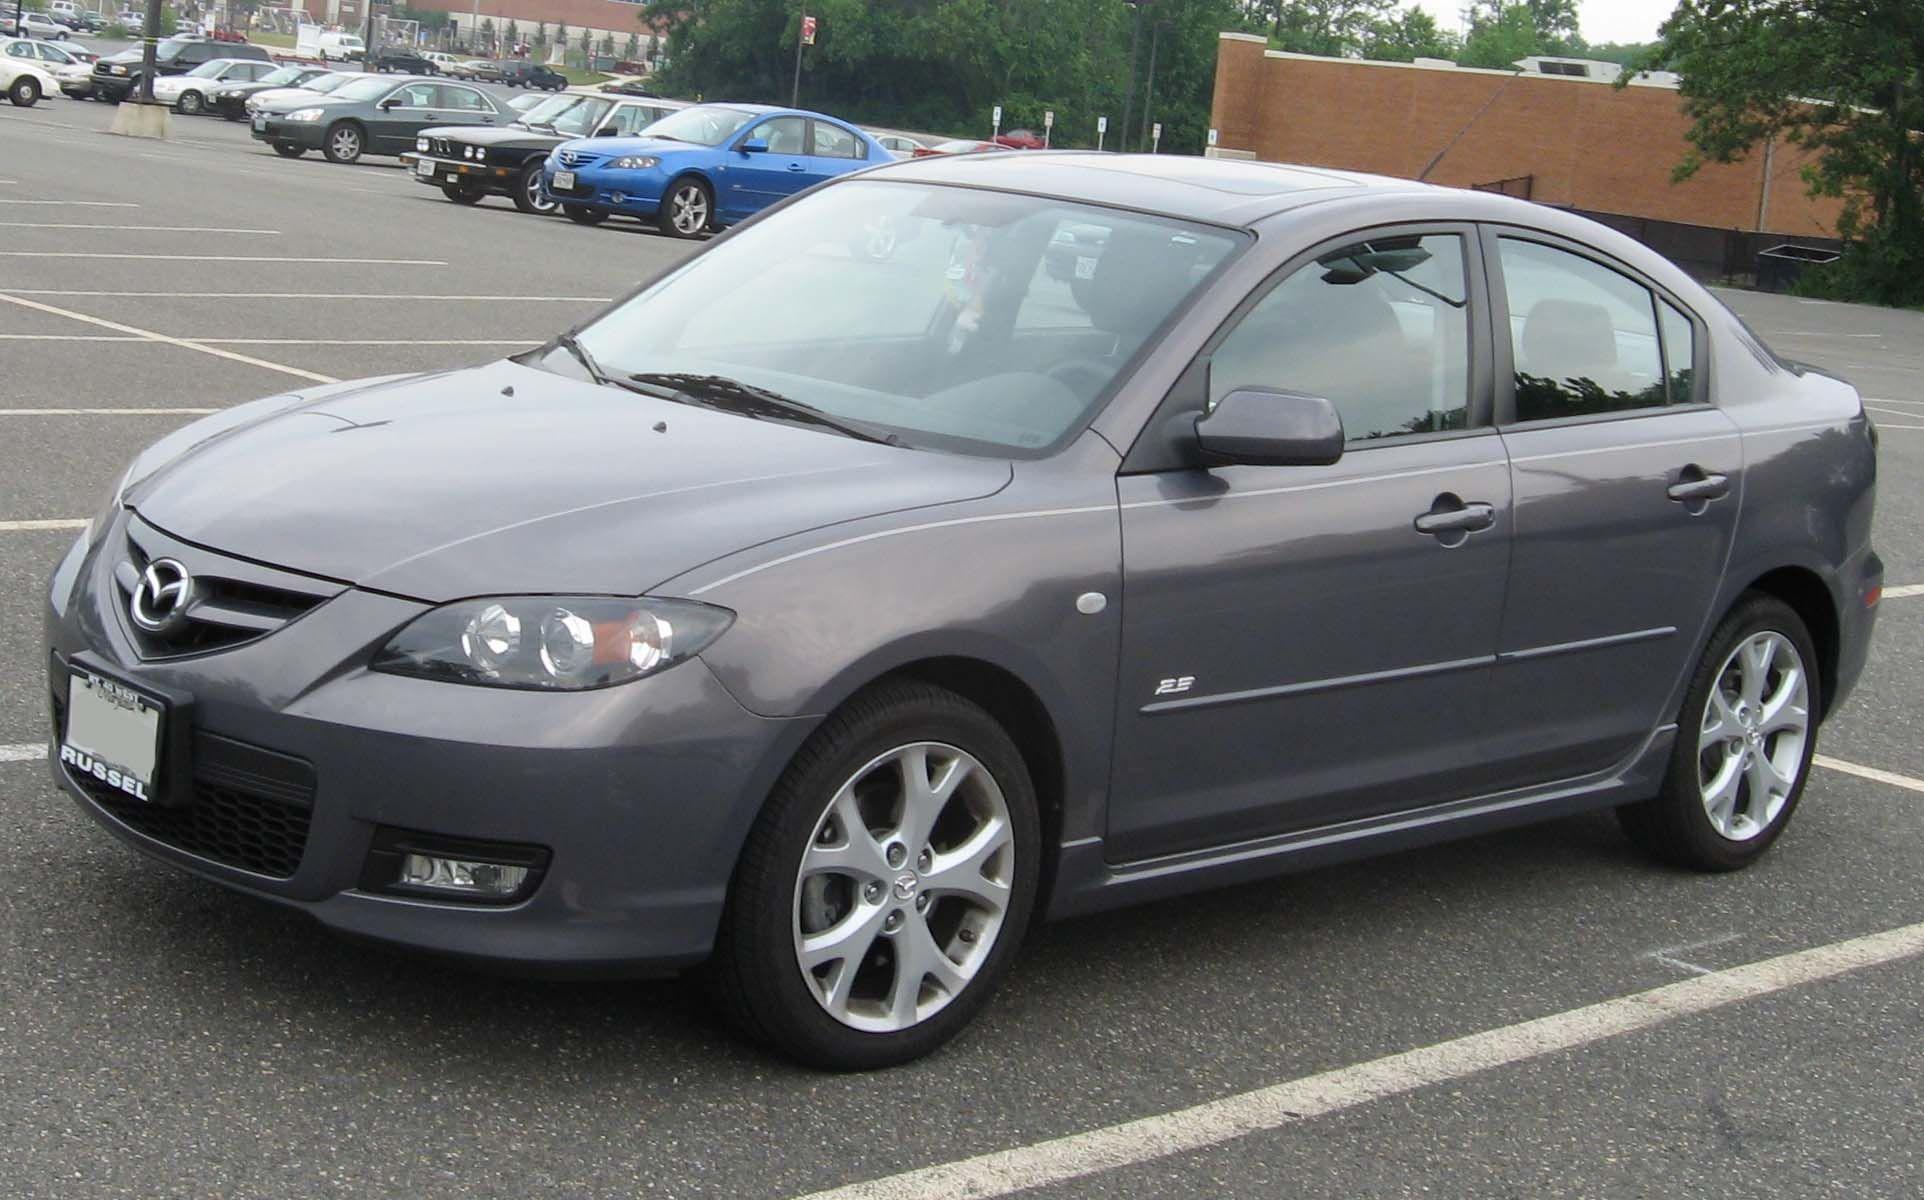 Kelebihan Kekurangan Mazda 3 2007 Murah Berkualitas